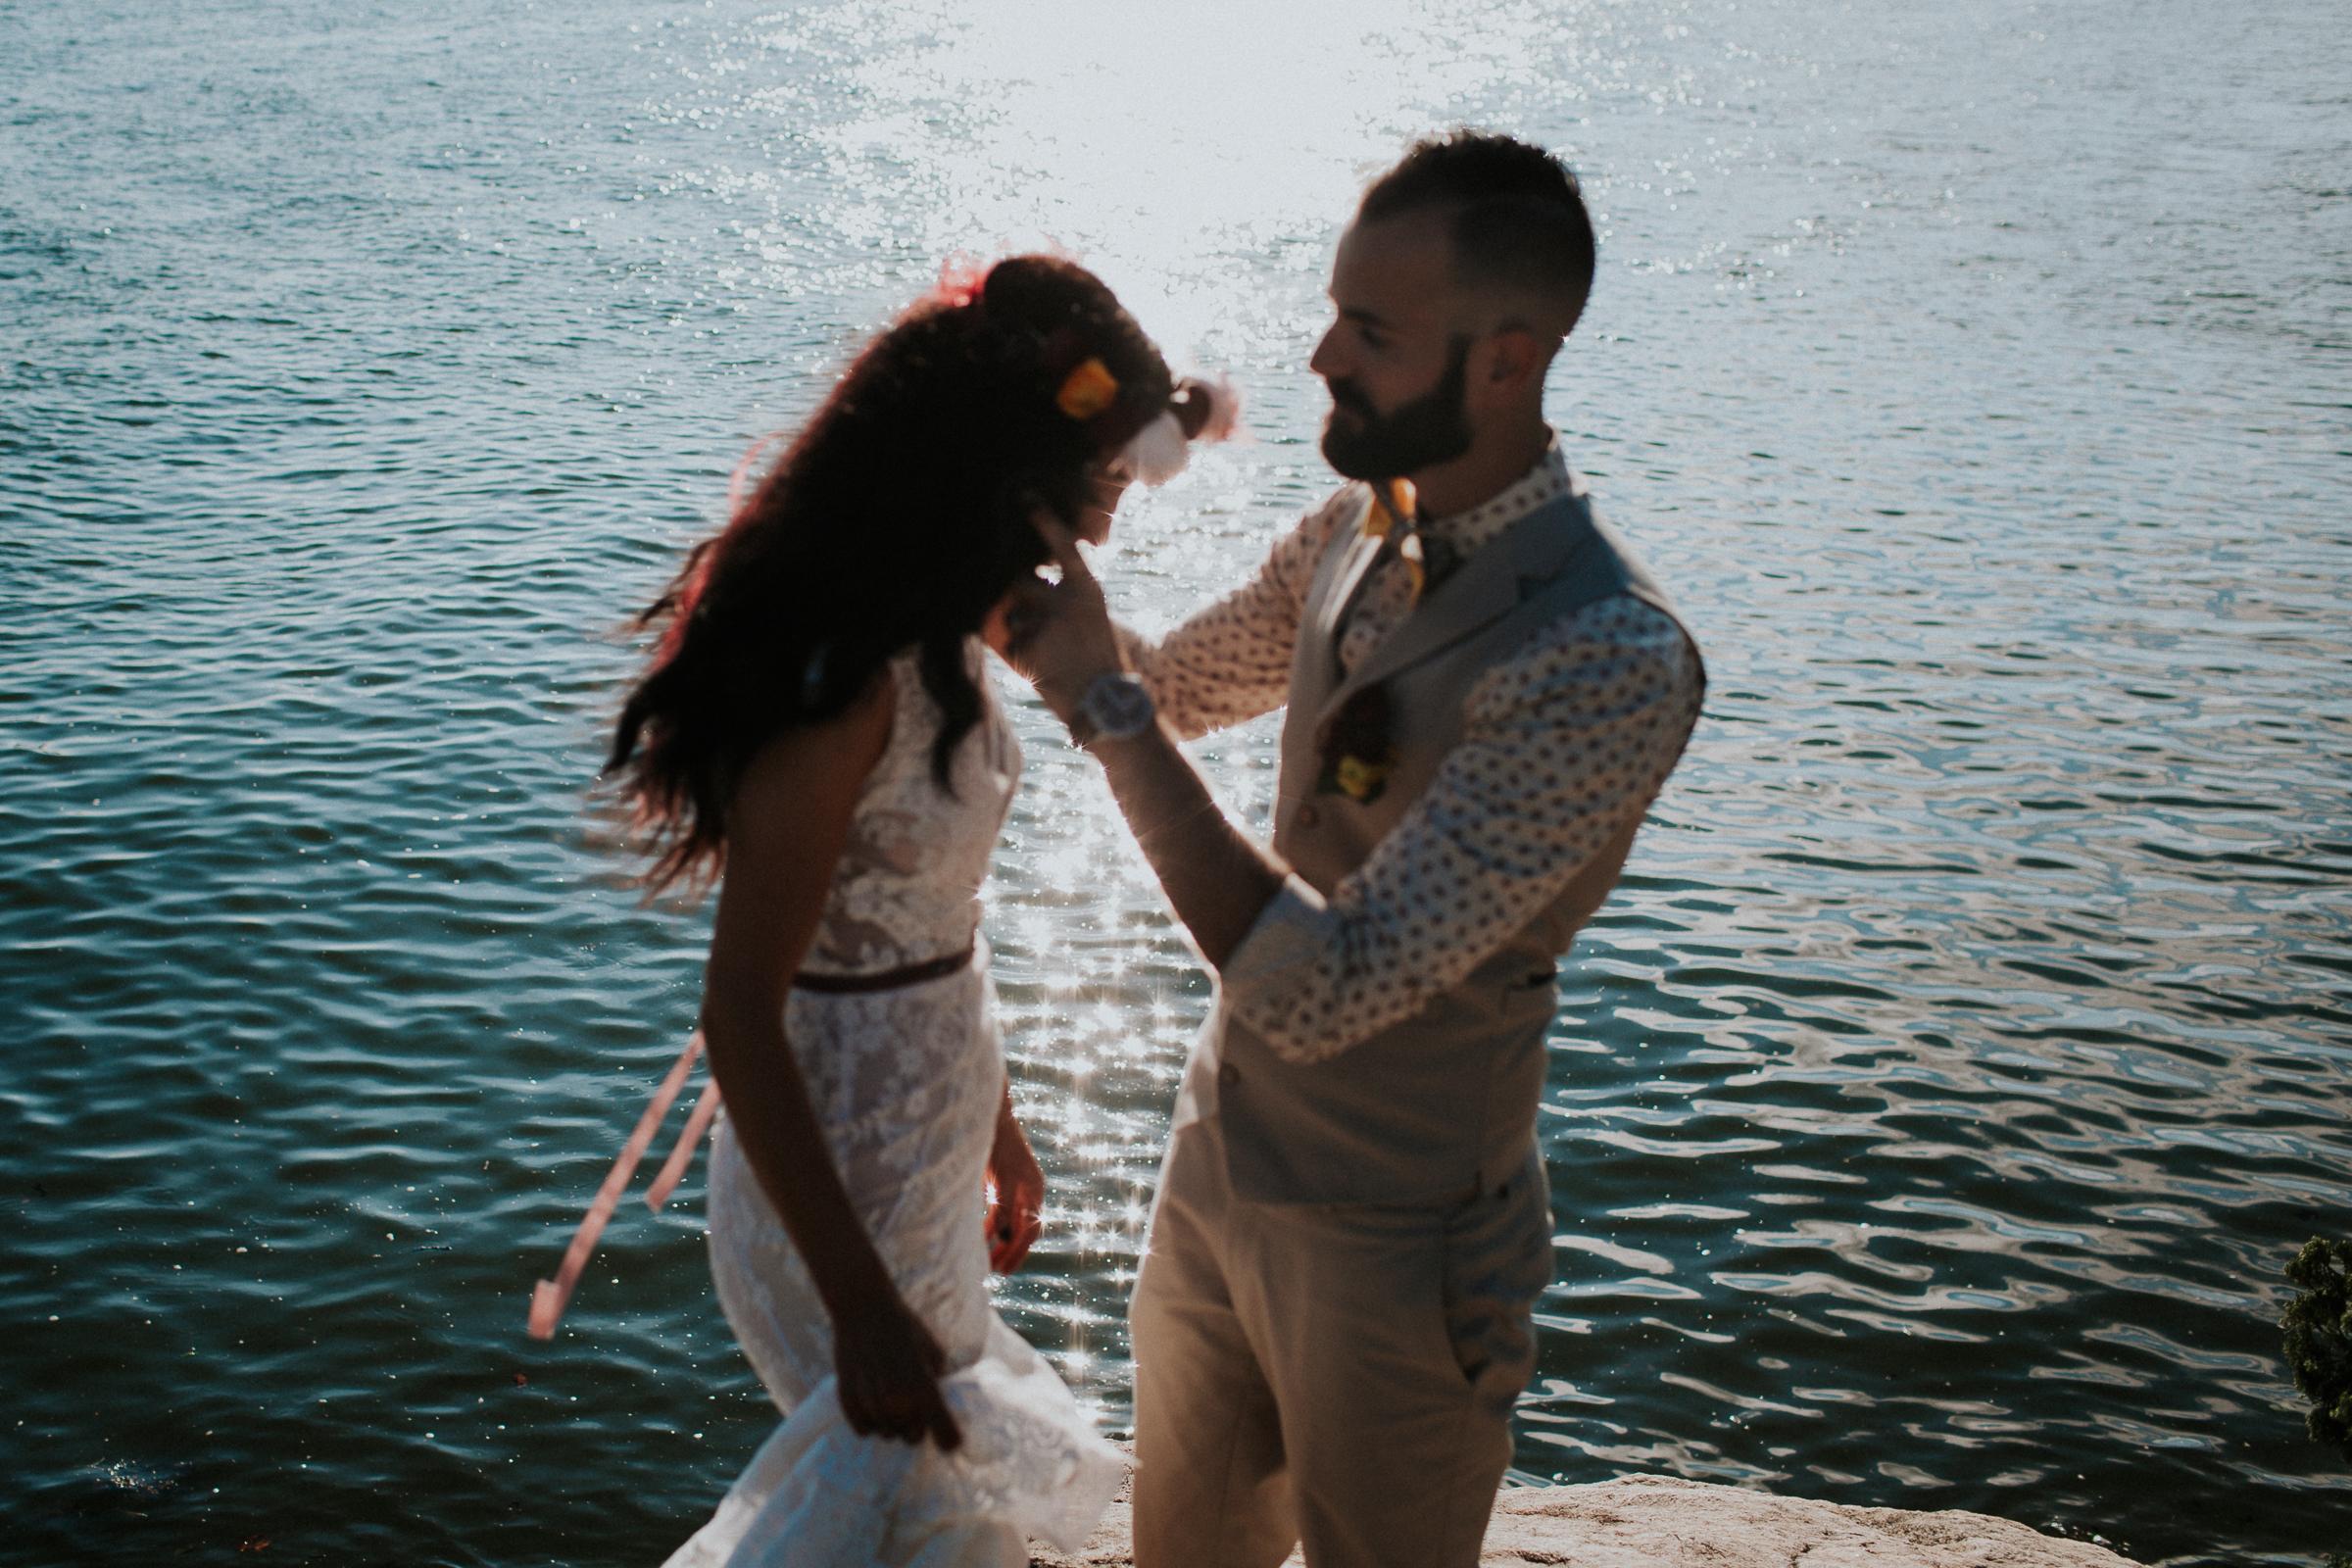 New-York-Documentary-Wedding-Photography-Best-Of-2017-by-Elvira-Kalviste-Photography-67.jpg